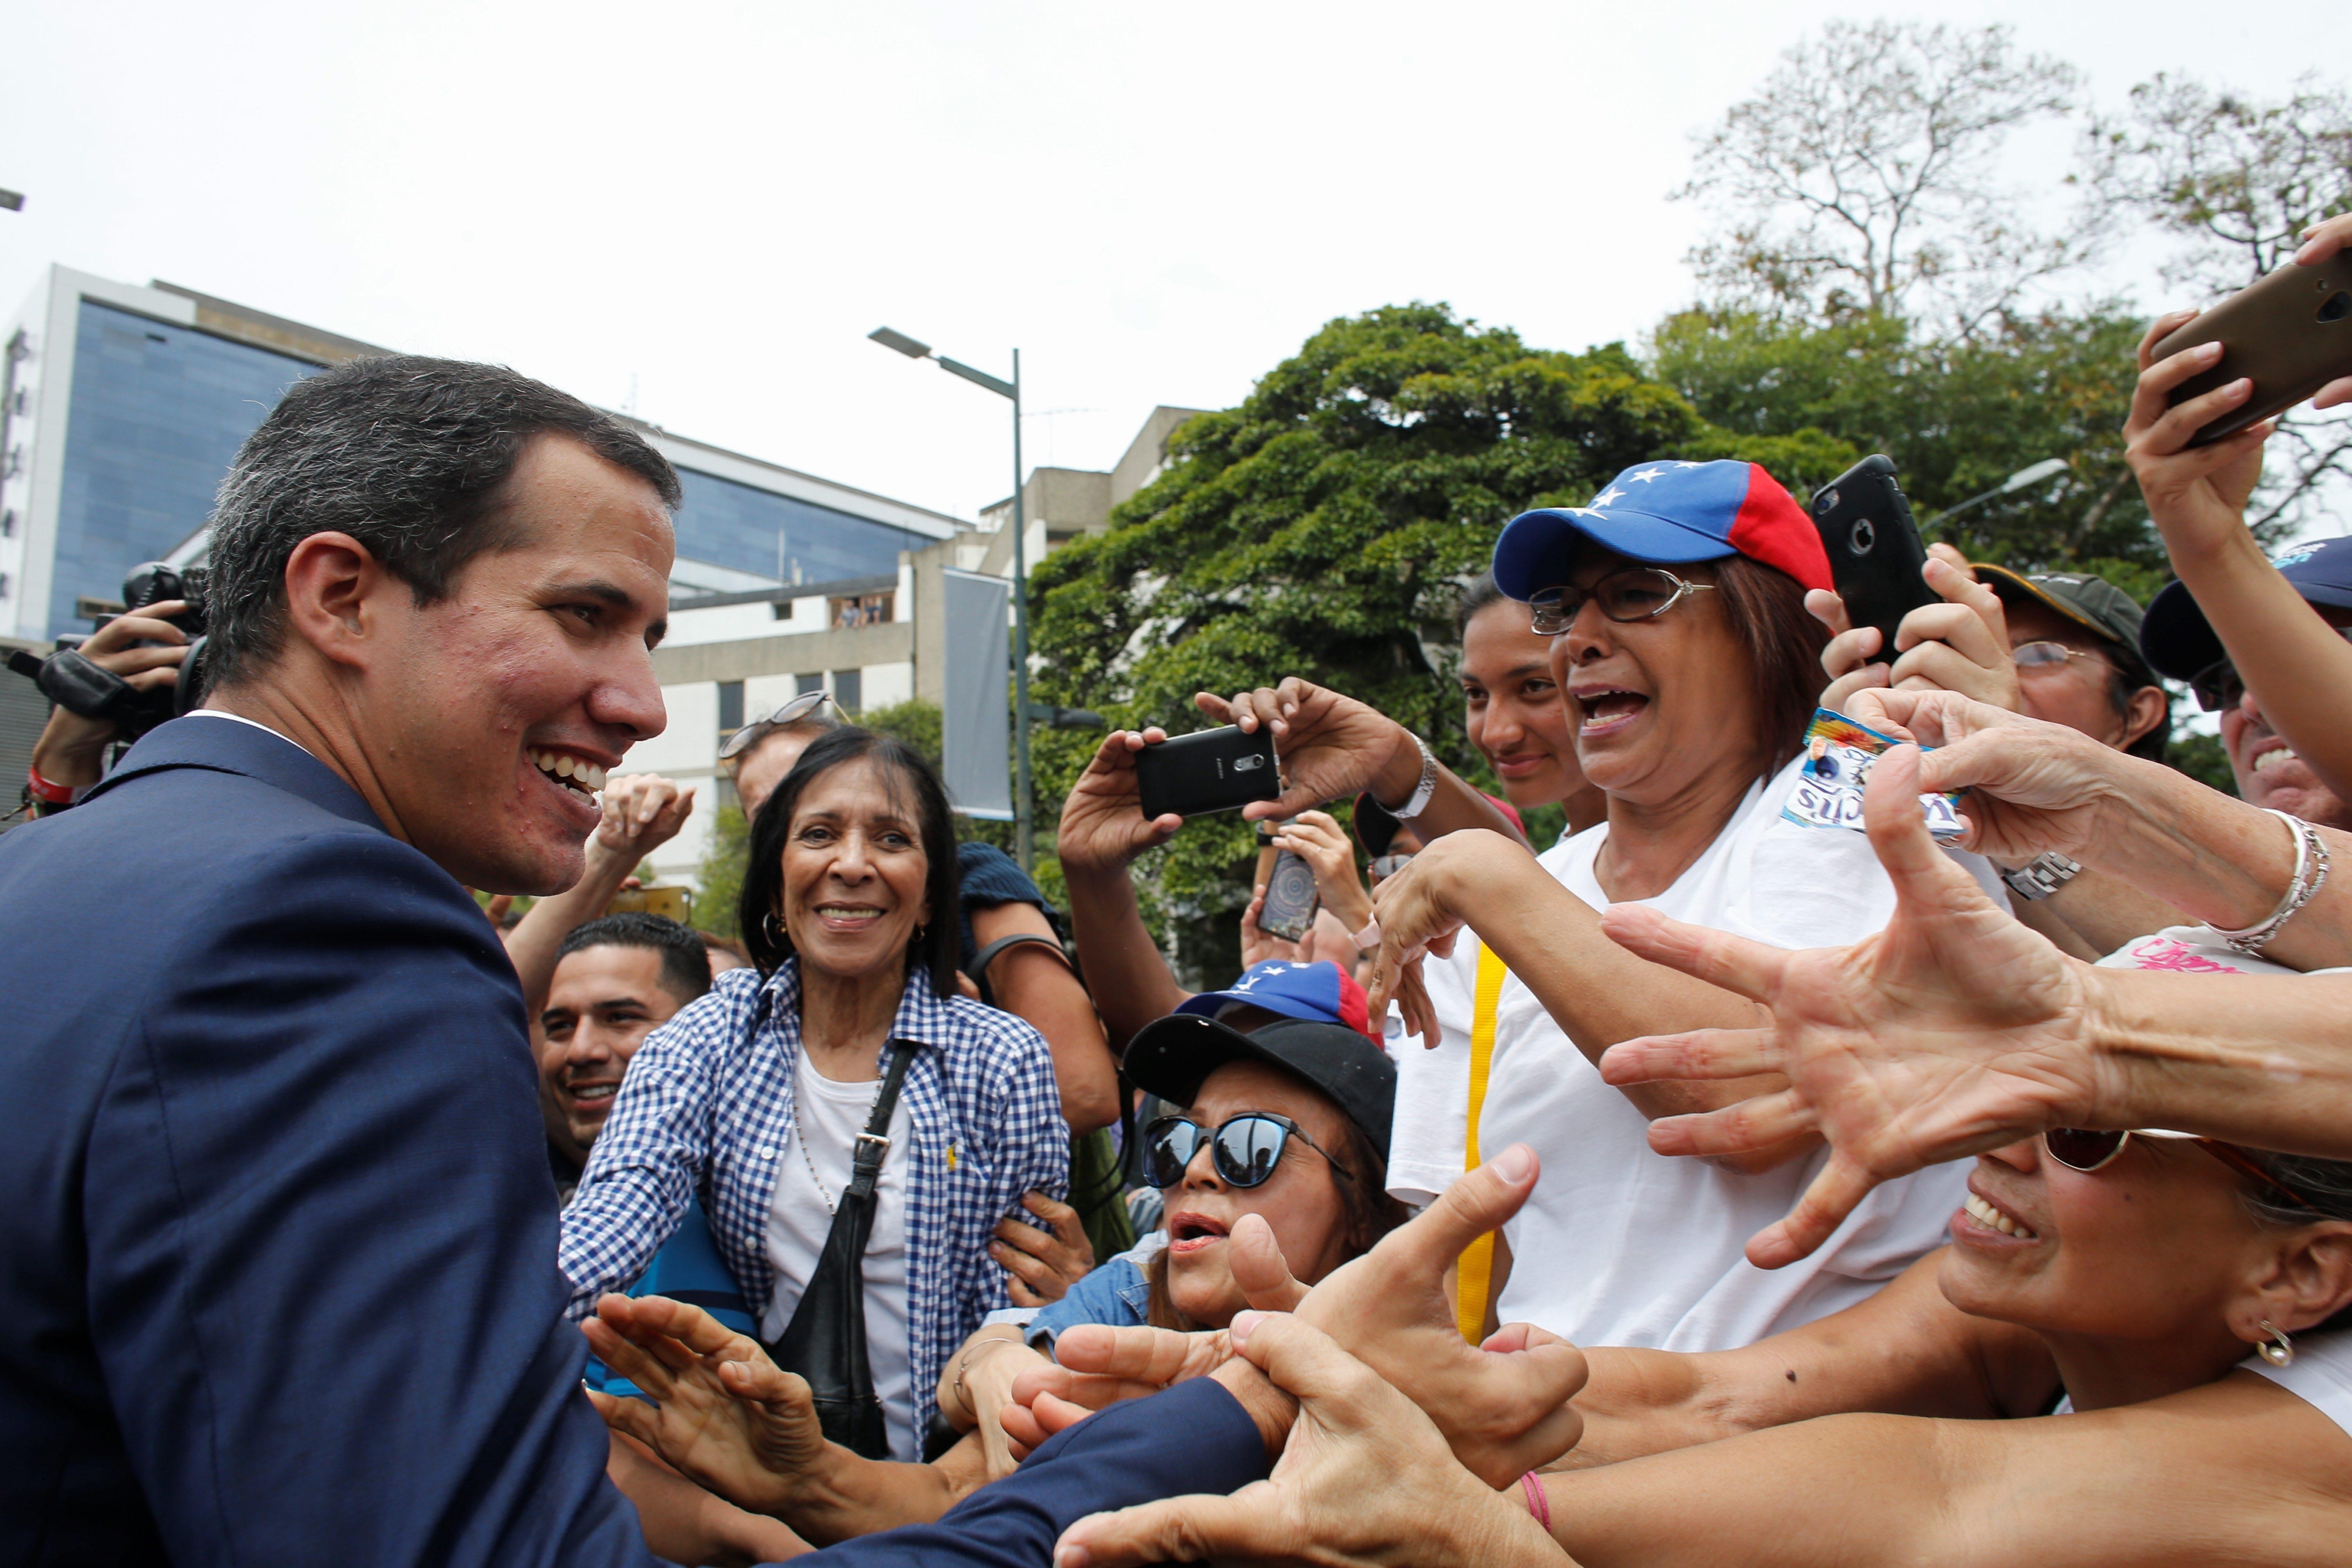 Elliott Abrams says more sanctions on Venezuela coming